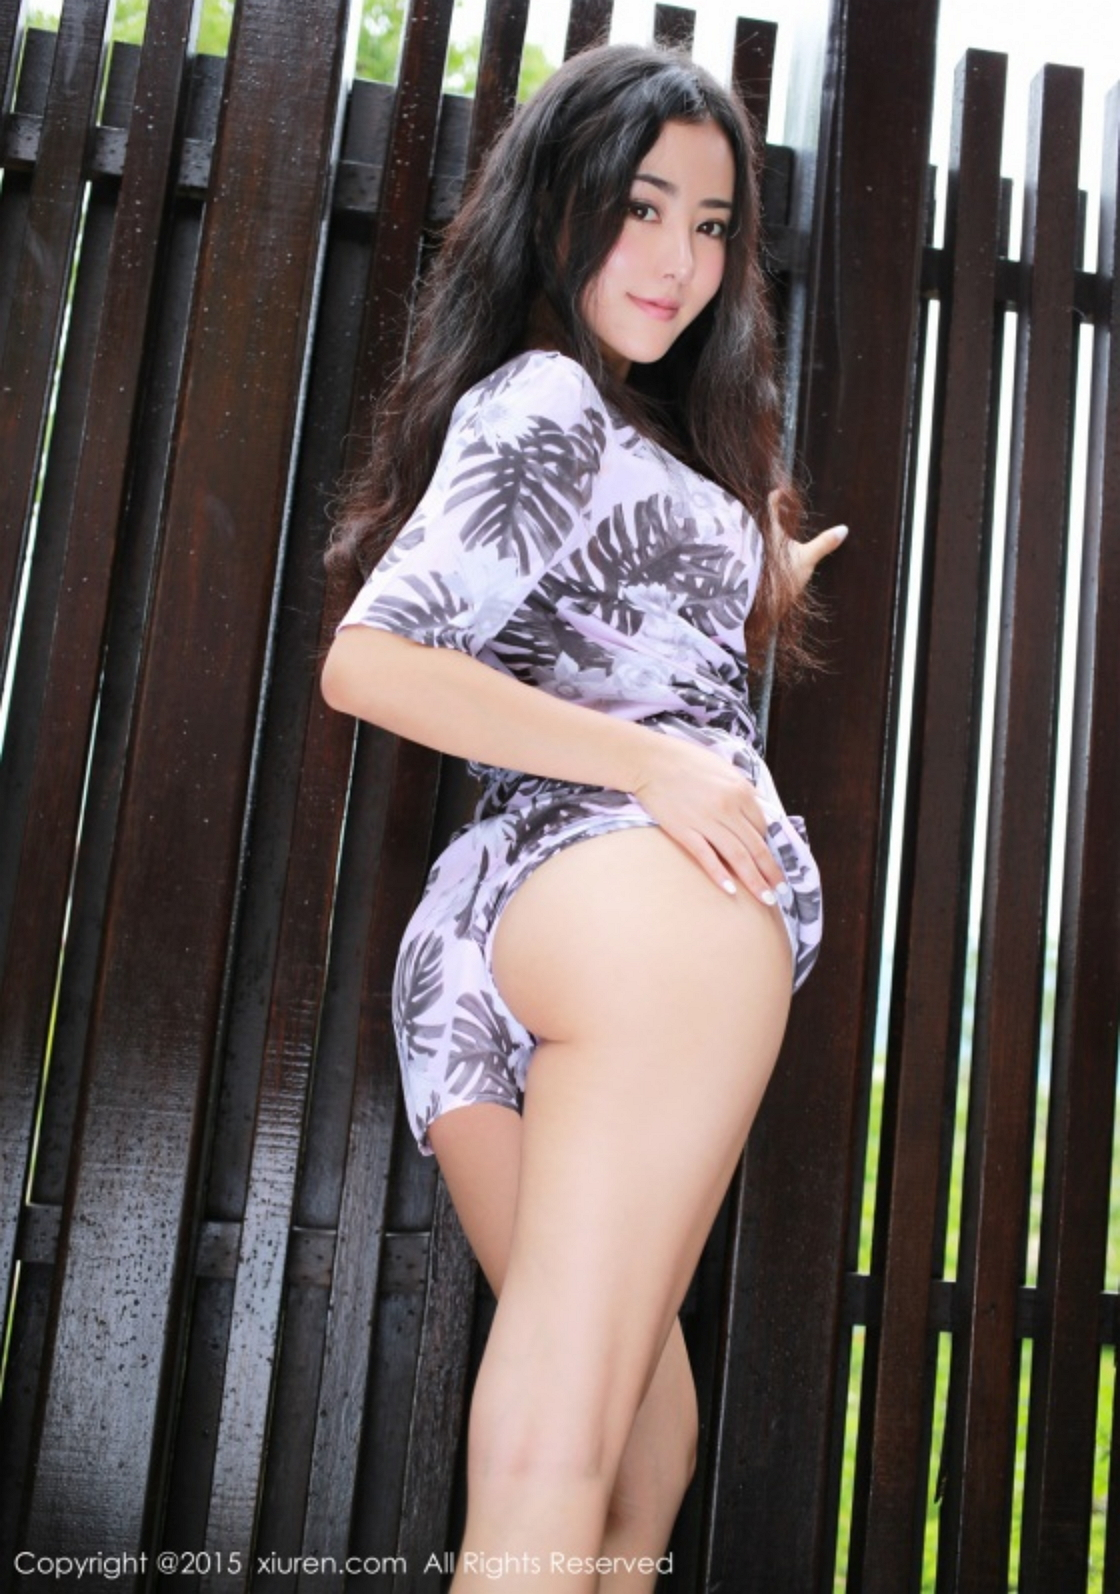 329 049 - Hot Photo XIUREN NO.329 Nude Girl